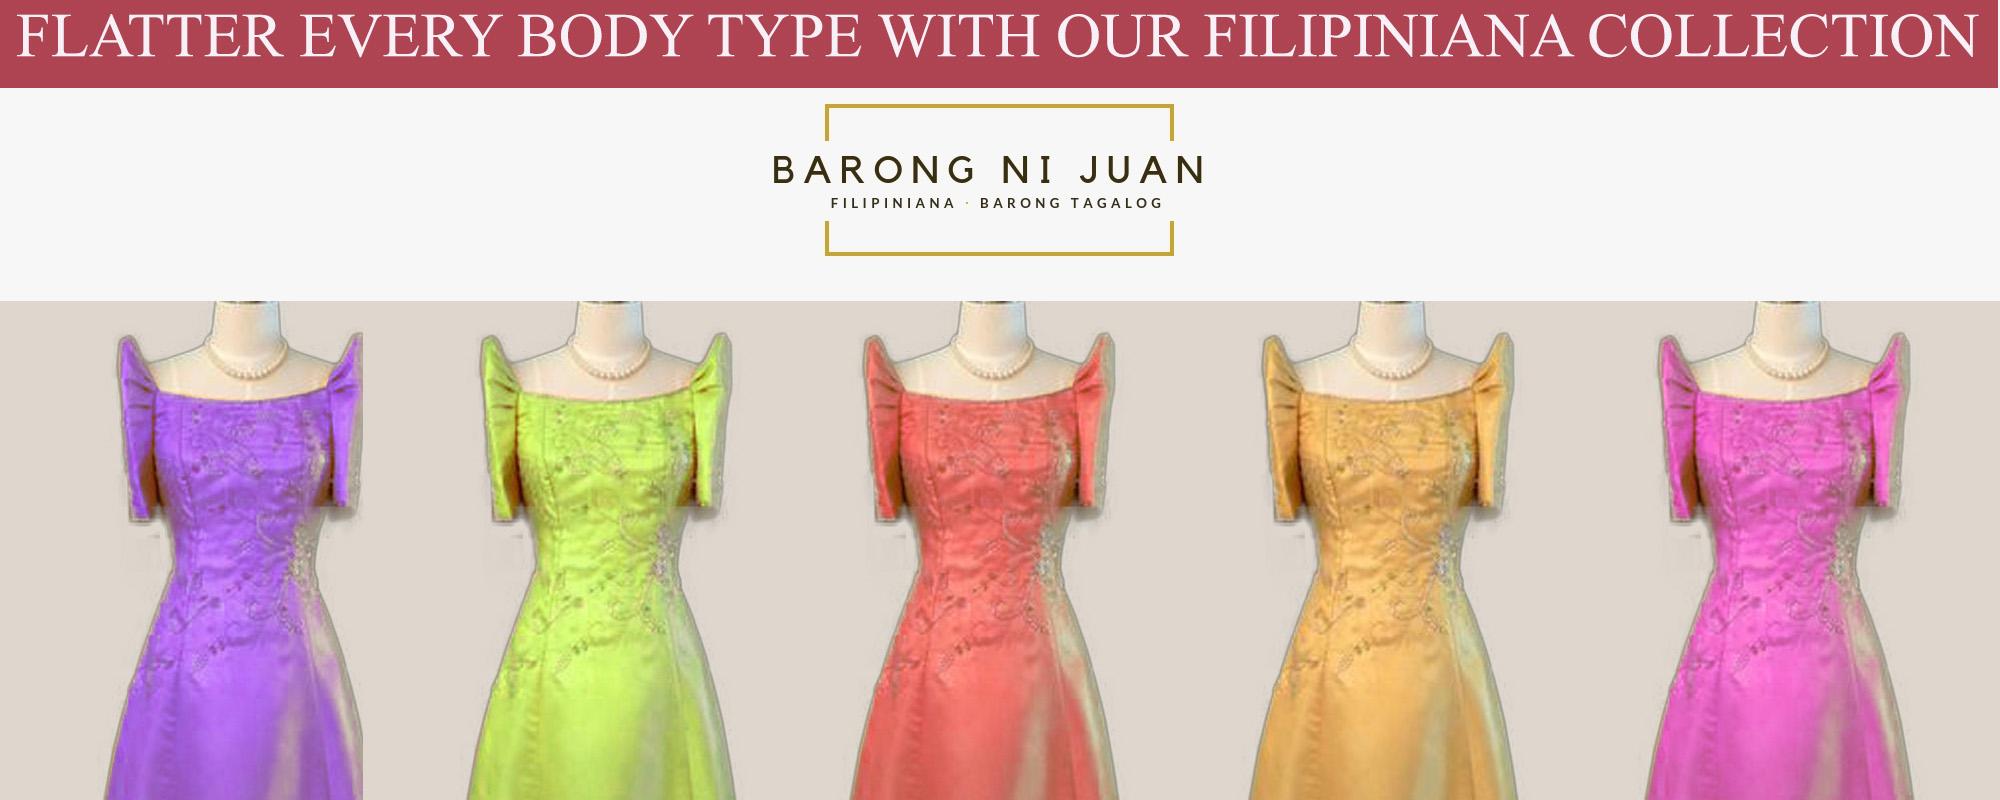 Jannamoda Garments Manufacturer And Distributor Of Barong Tagalog Filipiniana Gowns Wedding Attires Company Shirts And Uniforms